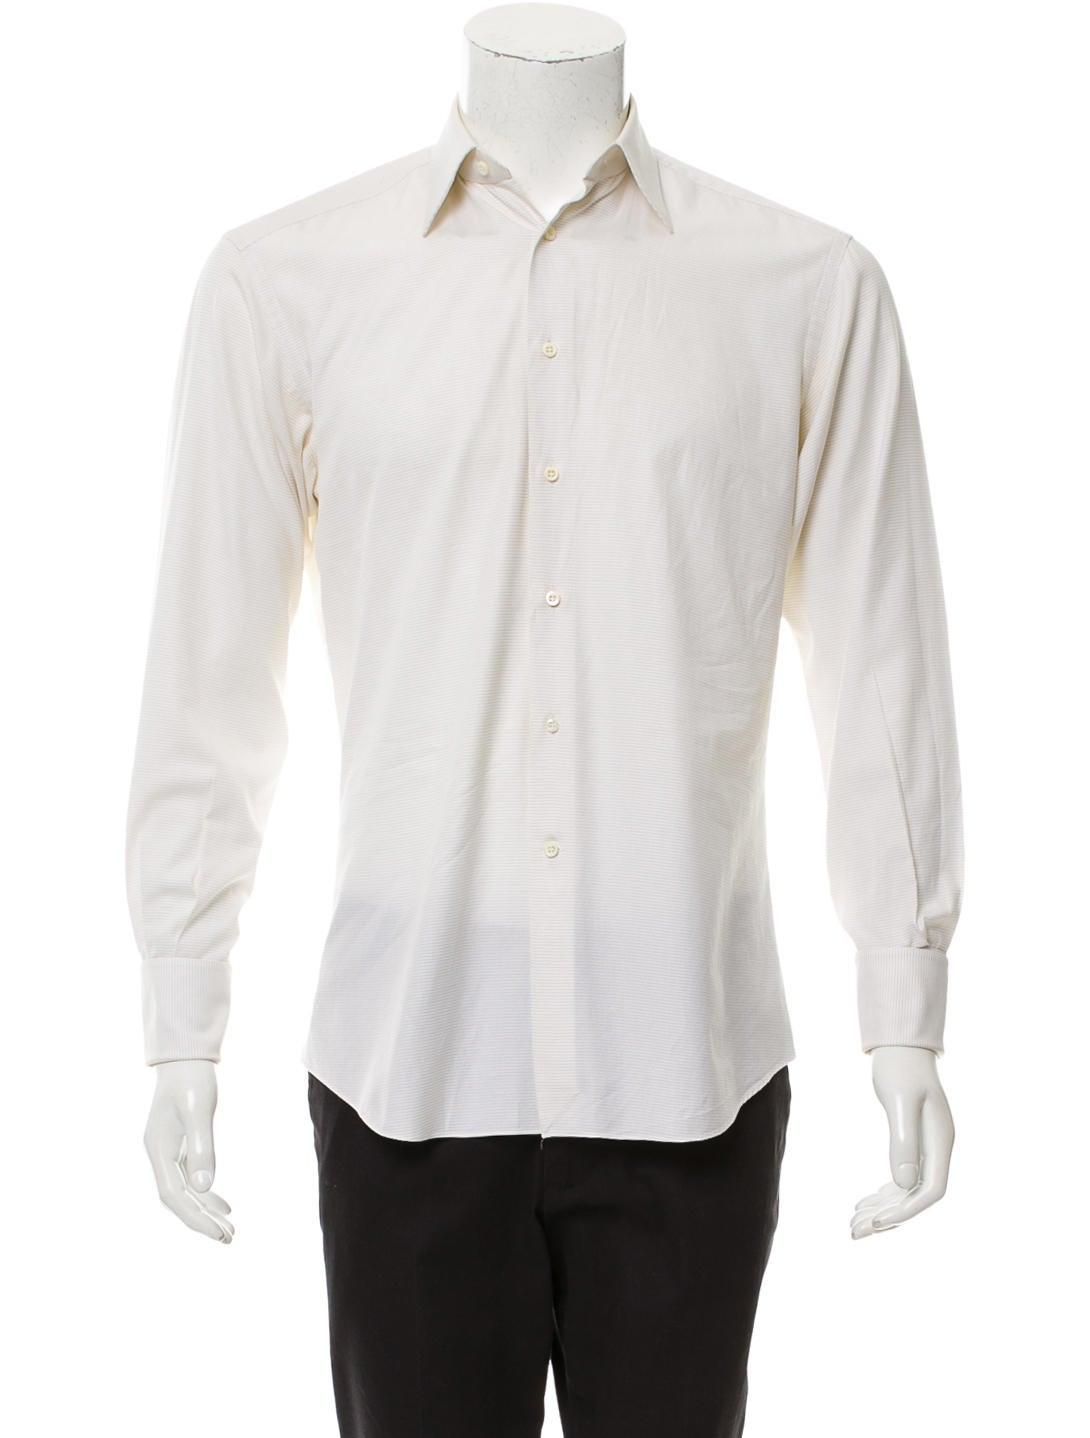 Ermenegildo Zegna Woven Abstract Dress Shirt Clothing Zgn28862